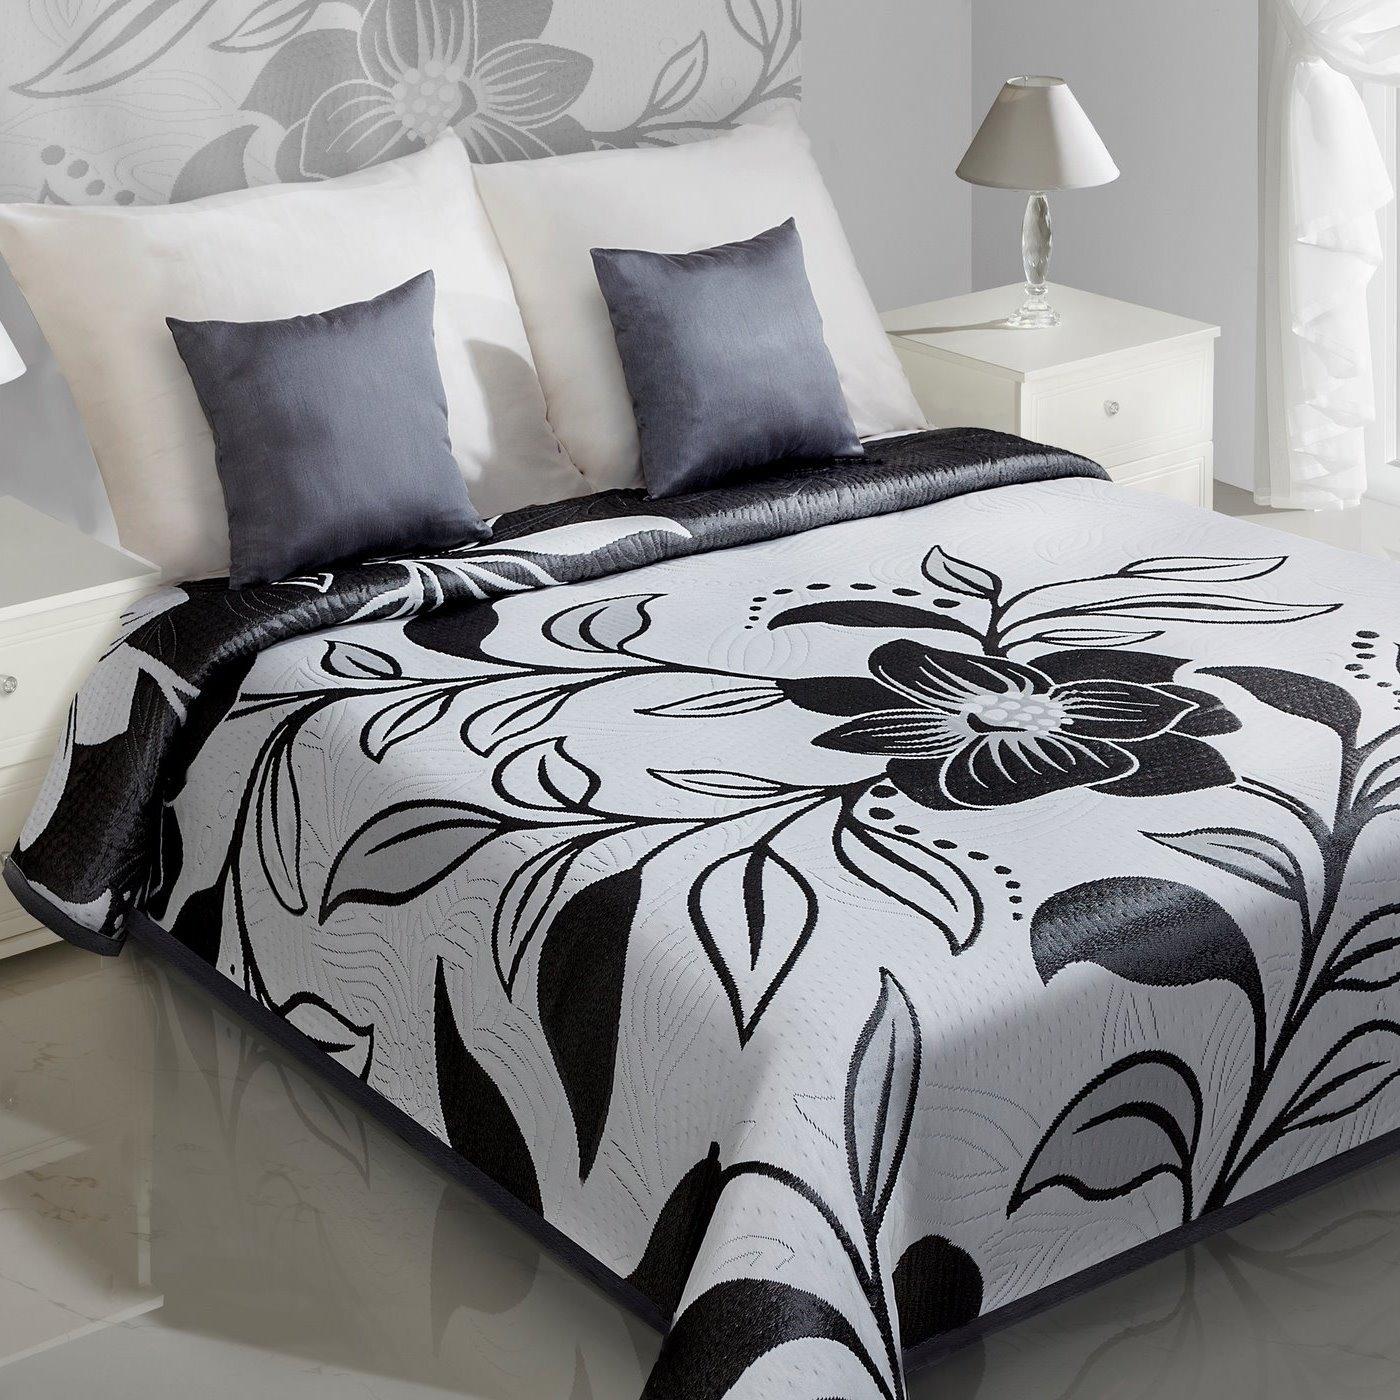 Cuvertura reversibila Lovetta Grey / Black 170 x 210 cm